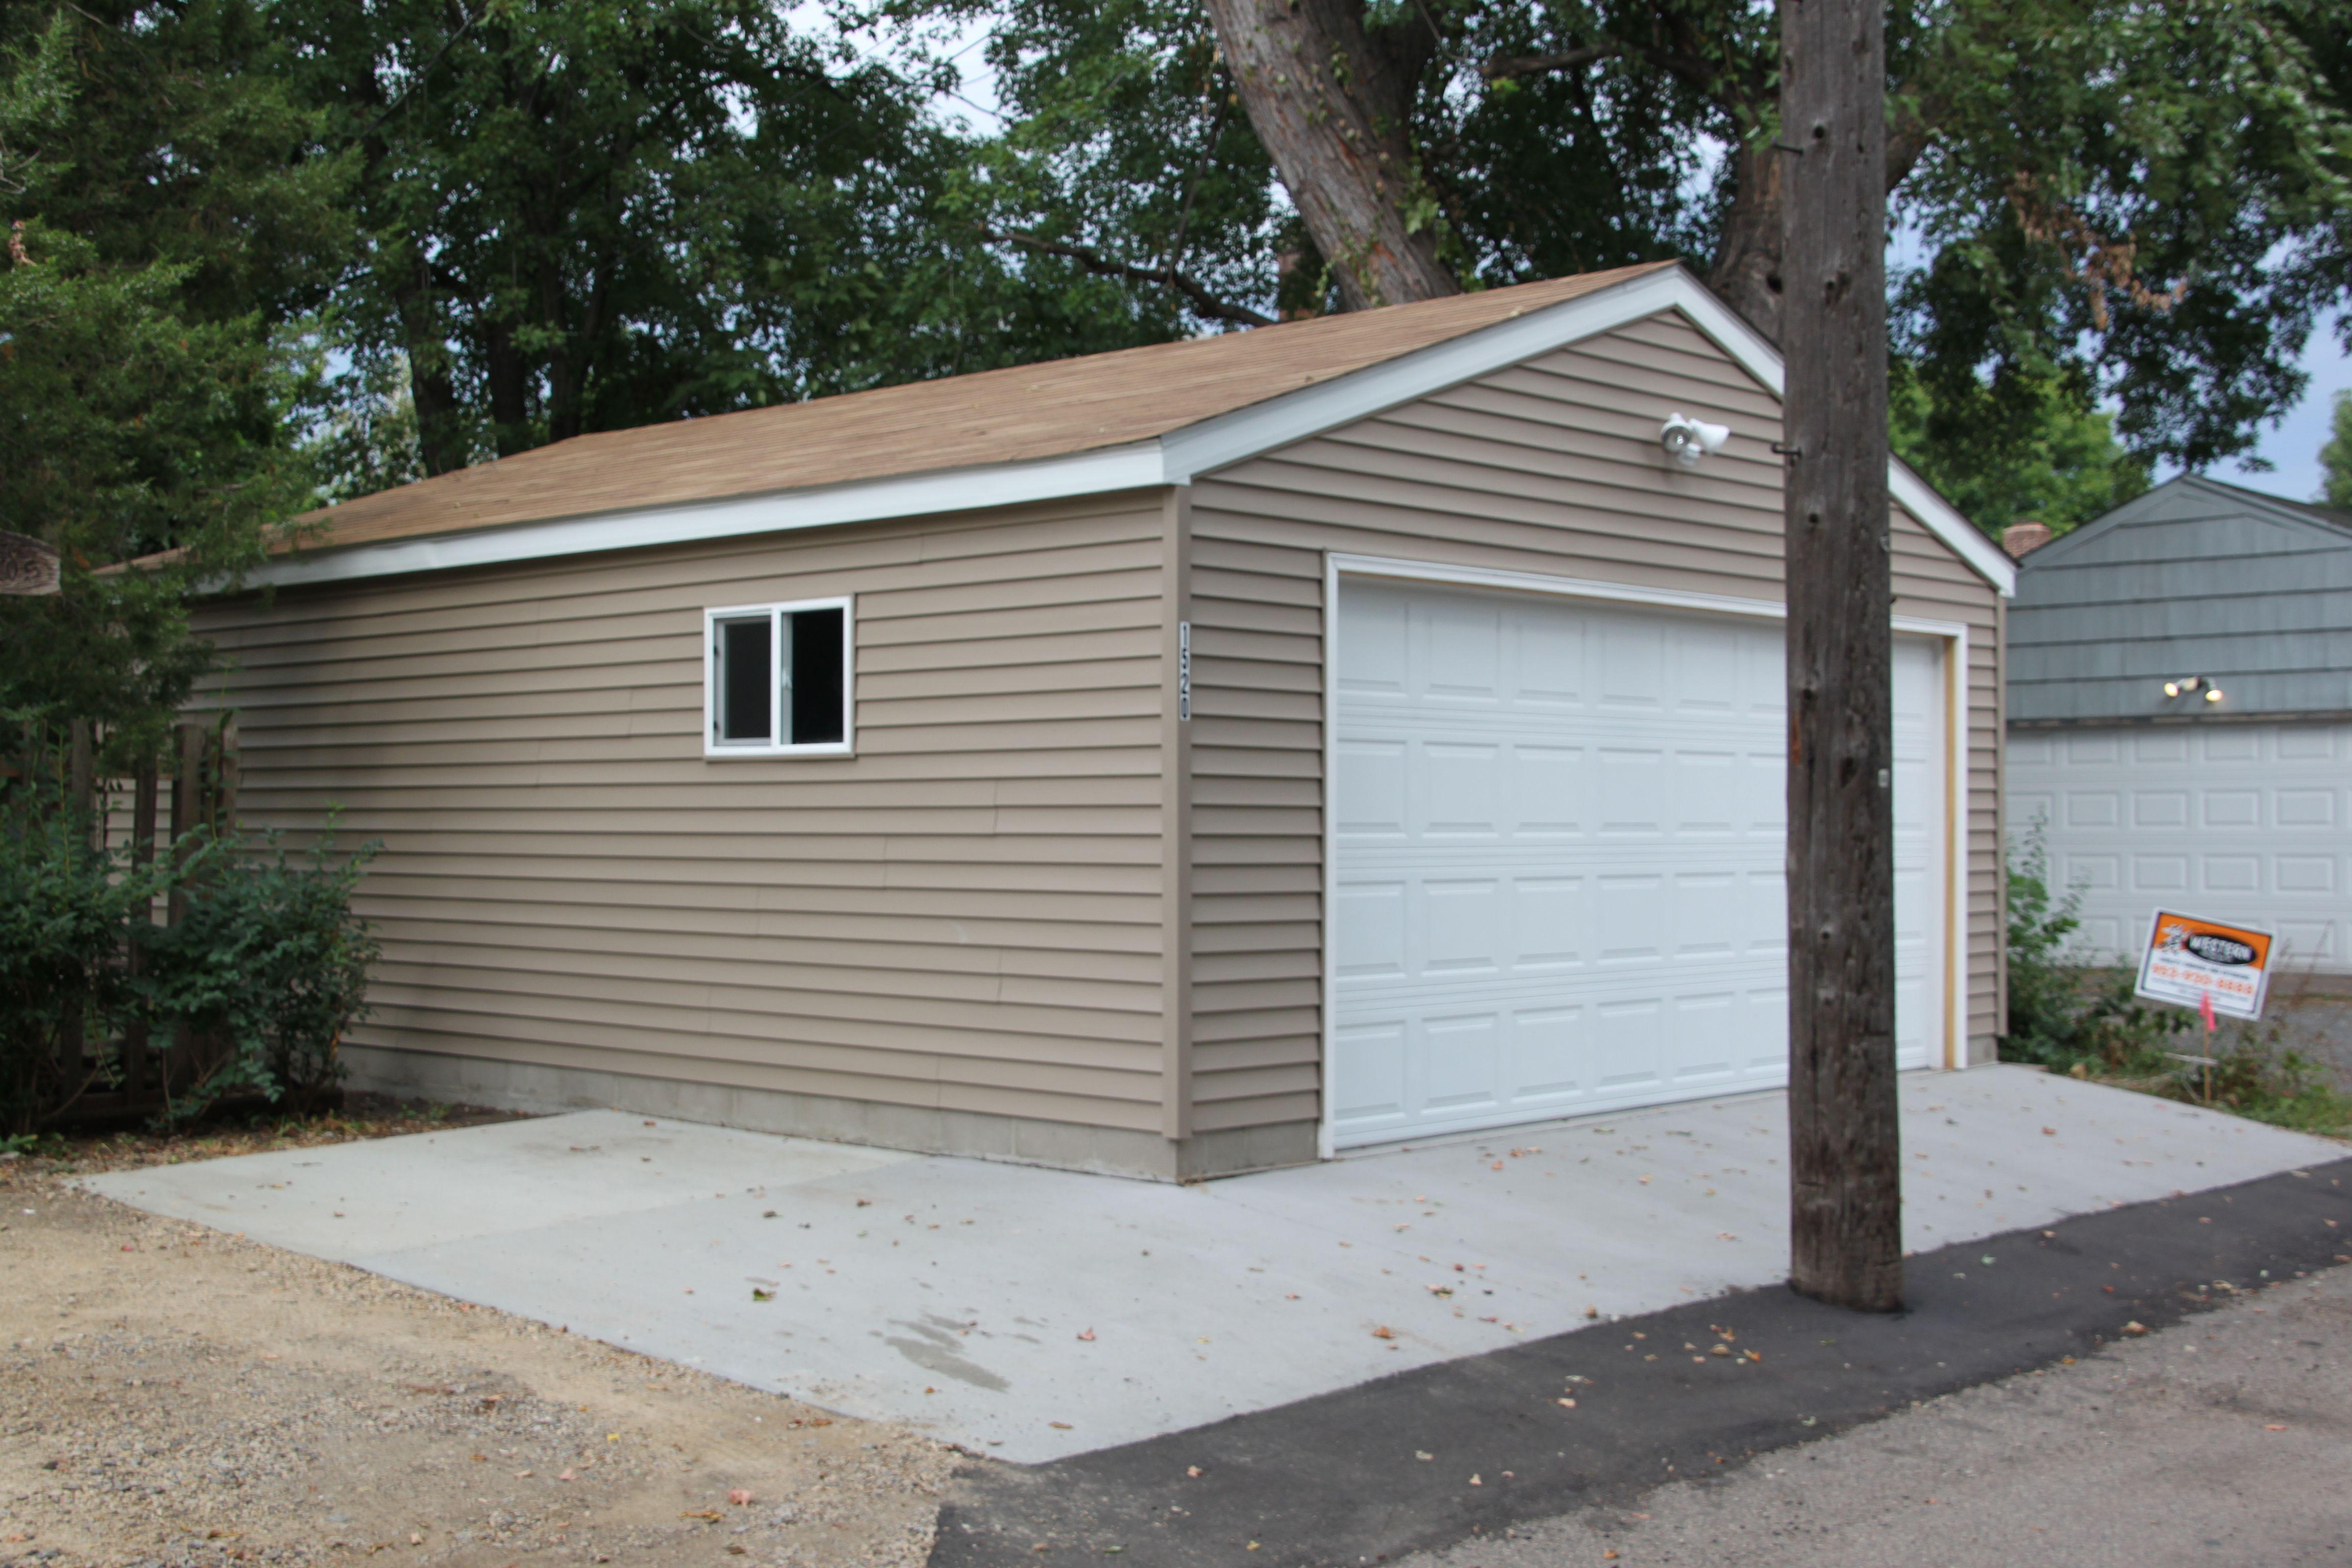 Stunning Cost Of Building A Garage Apartment Photos - Liltigertoo ...